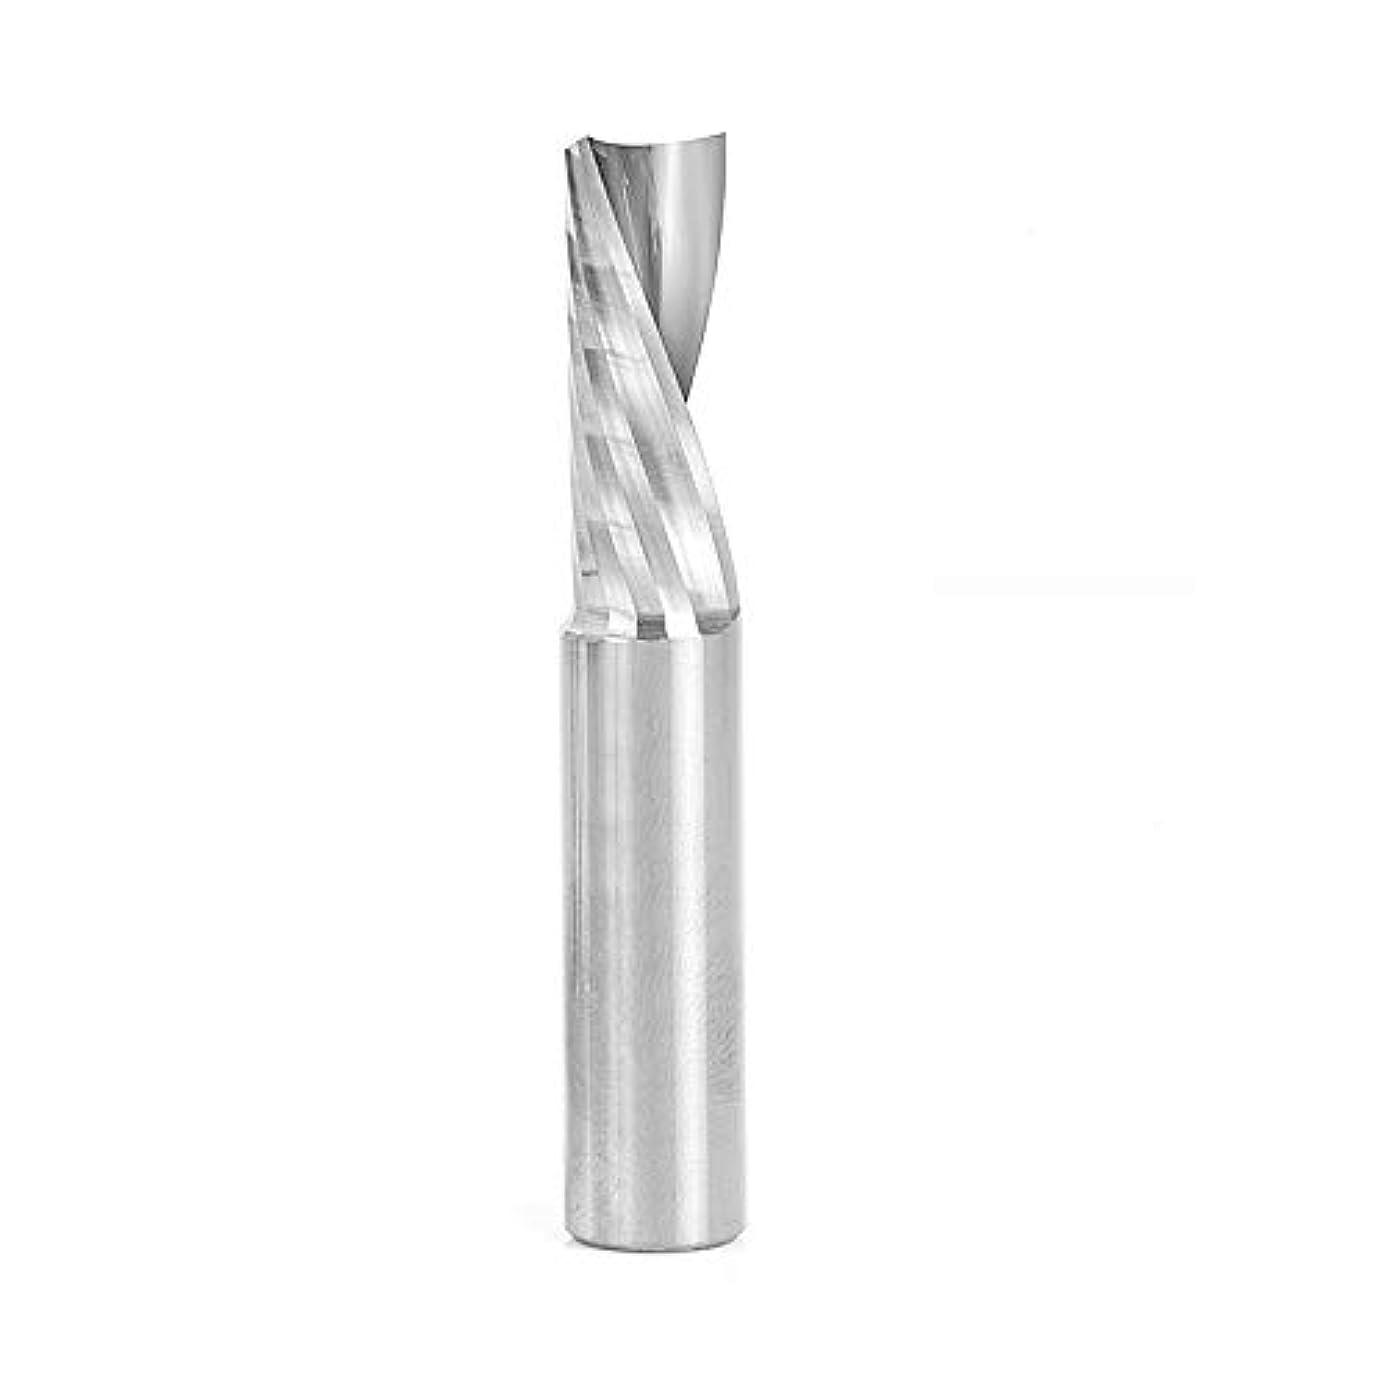 Amana Tool - 51529 Solid Carbide CNC Spiral 'O' Flute, Plastic Cutting 1/2 Dia x 1-1/4 x 1